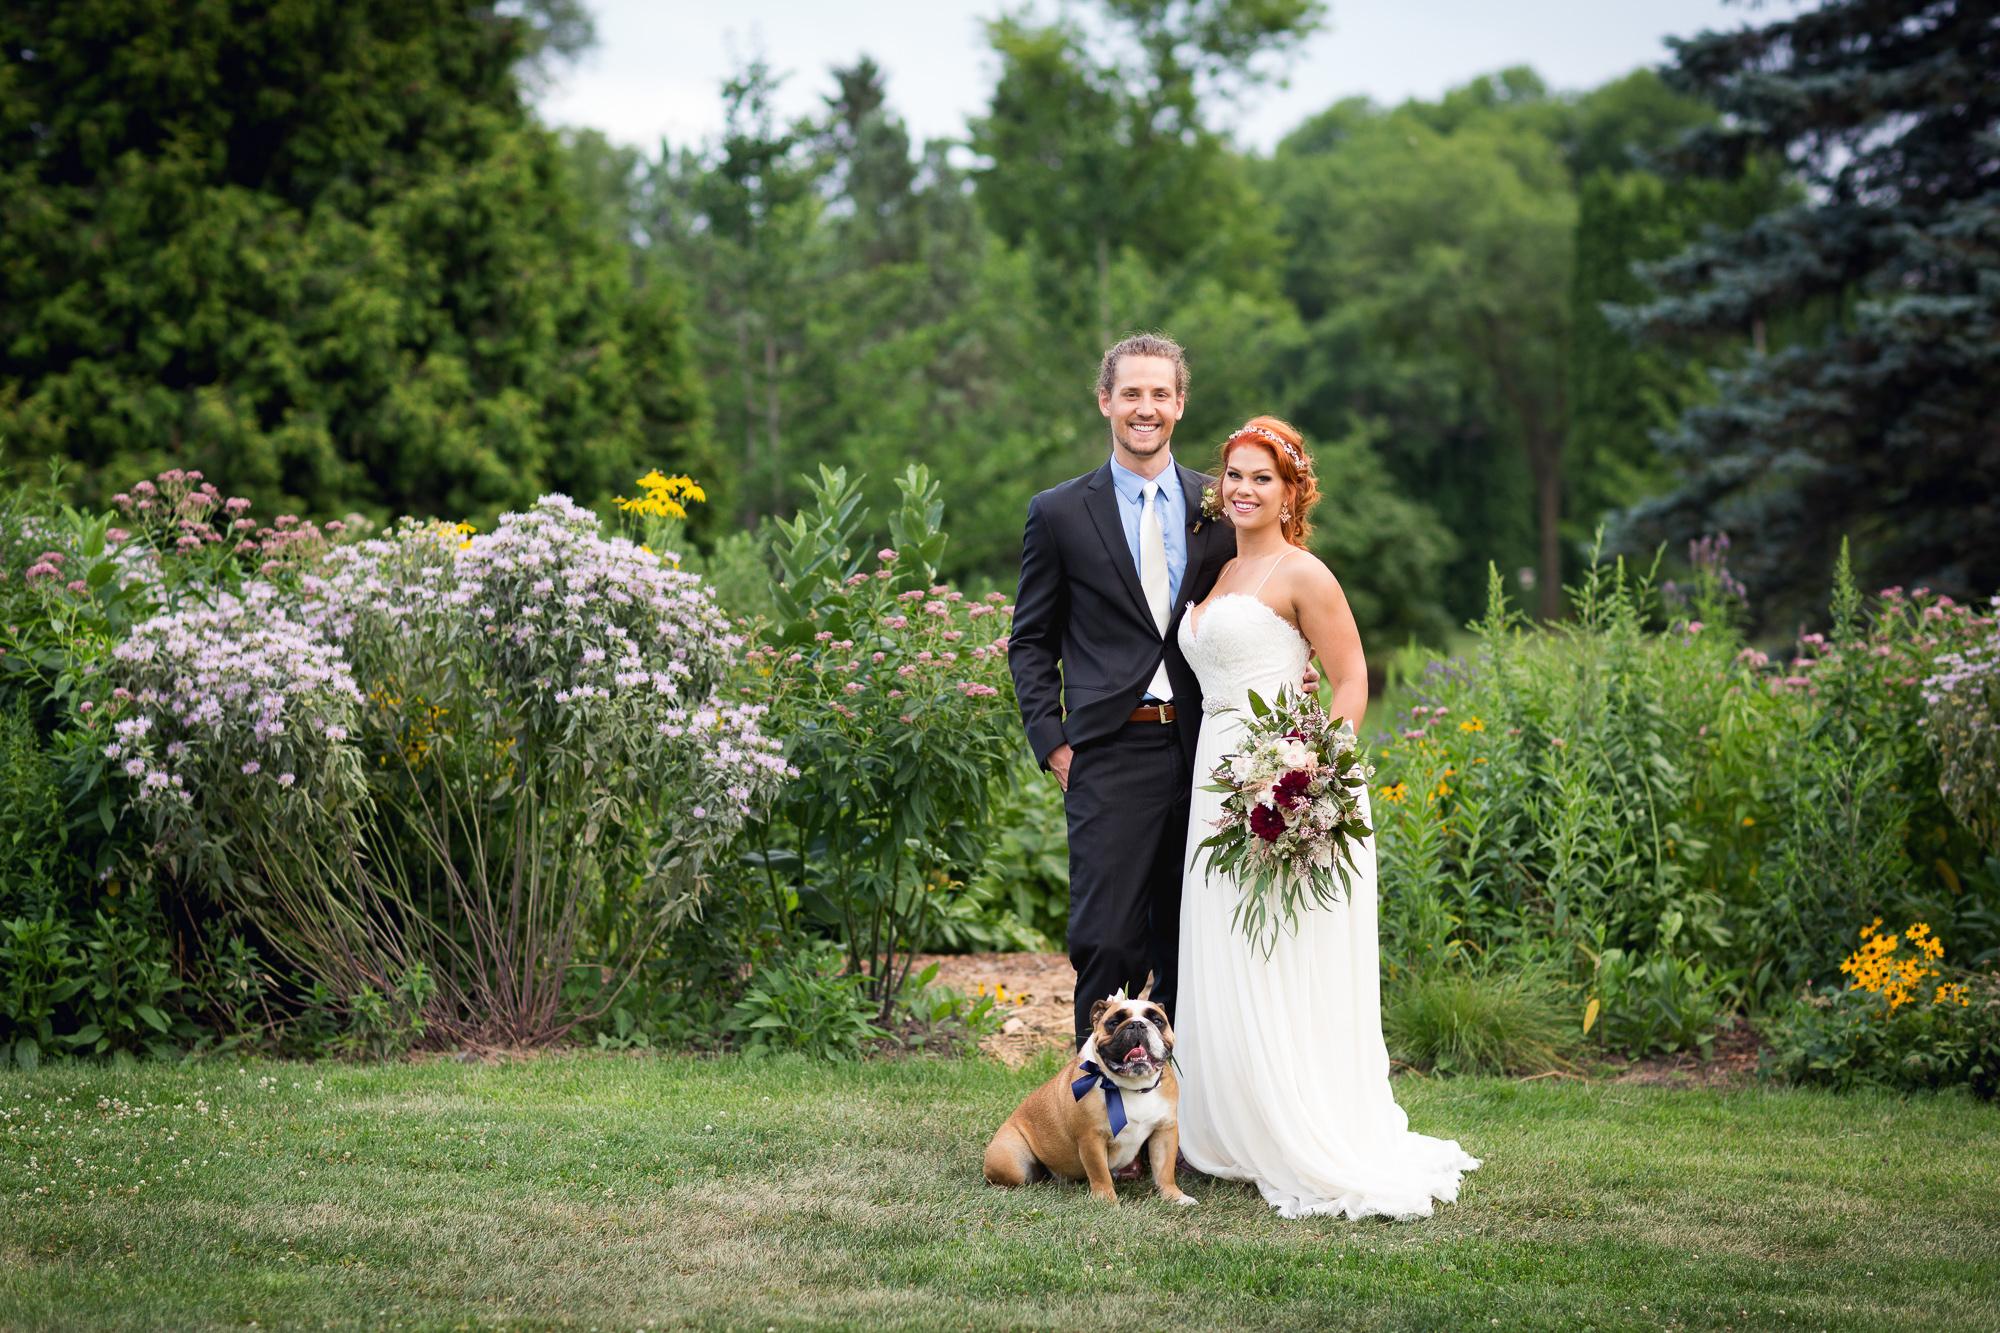 Wedding Couple with English Bulldog as a Ringbearer by San Diego Wedding Photographer